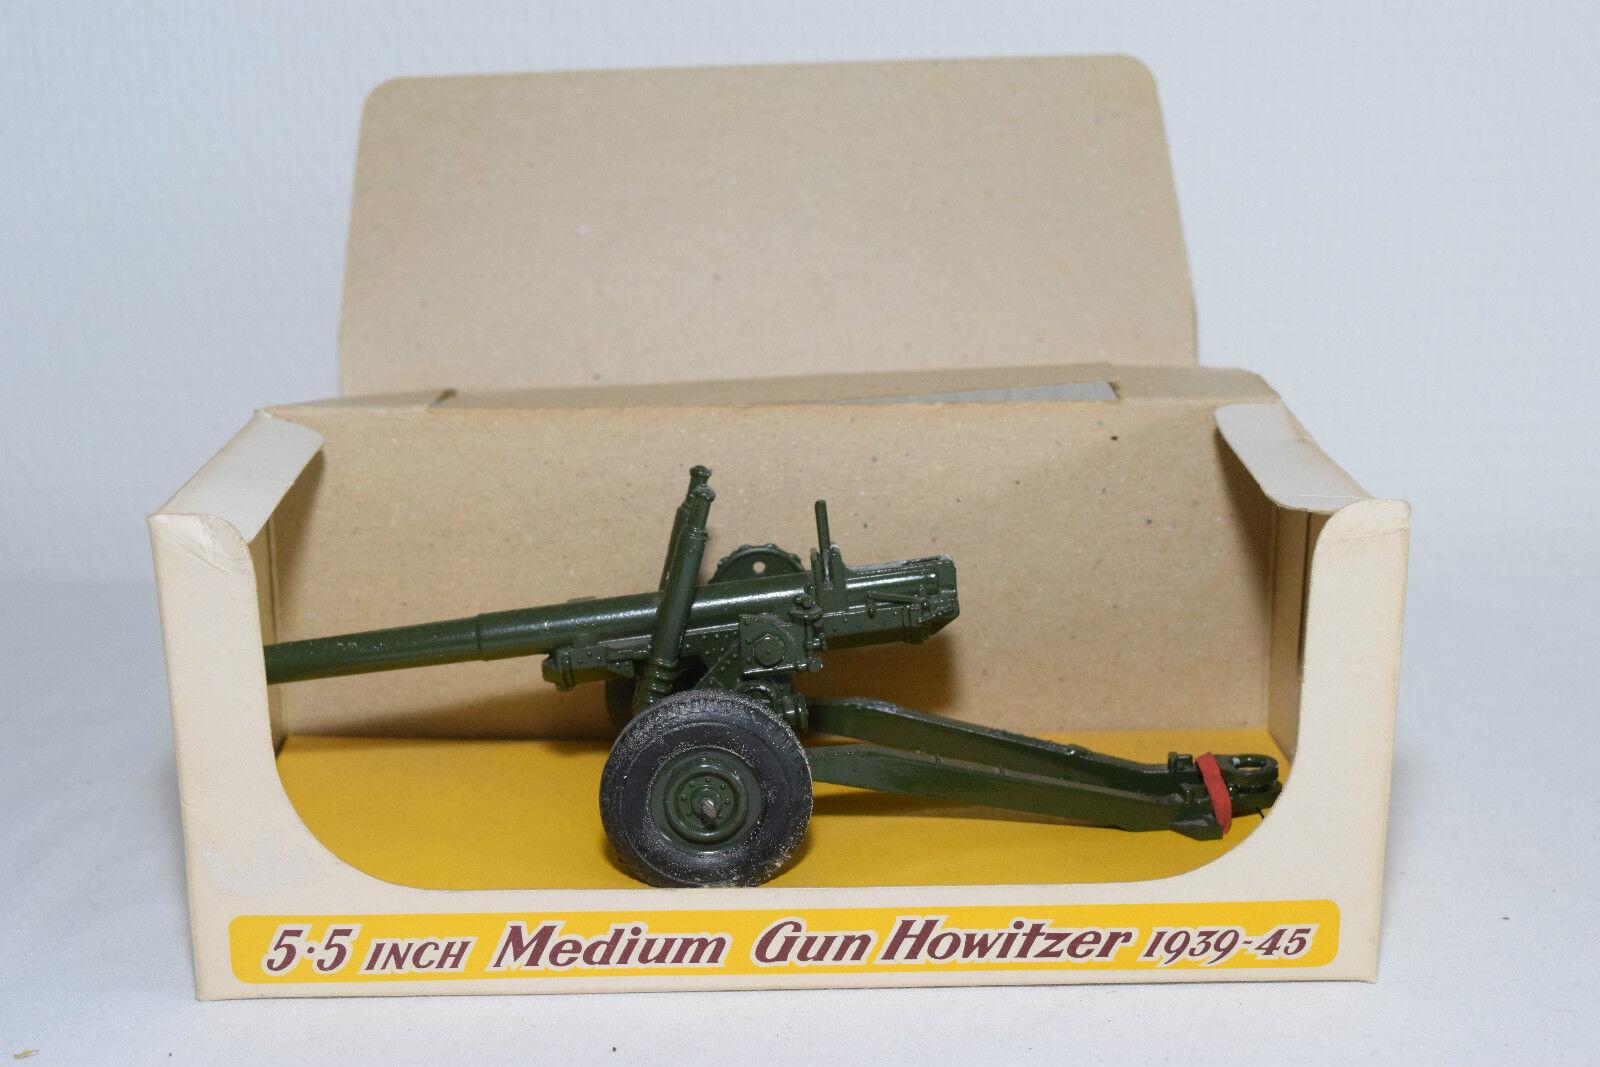 CRESCENT TOYS 1251 1251 1251 5.5 INCH MEDIUM GUN HOWITZER N MINT BOXED RARE SELTEN RARO 11f766